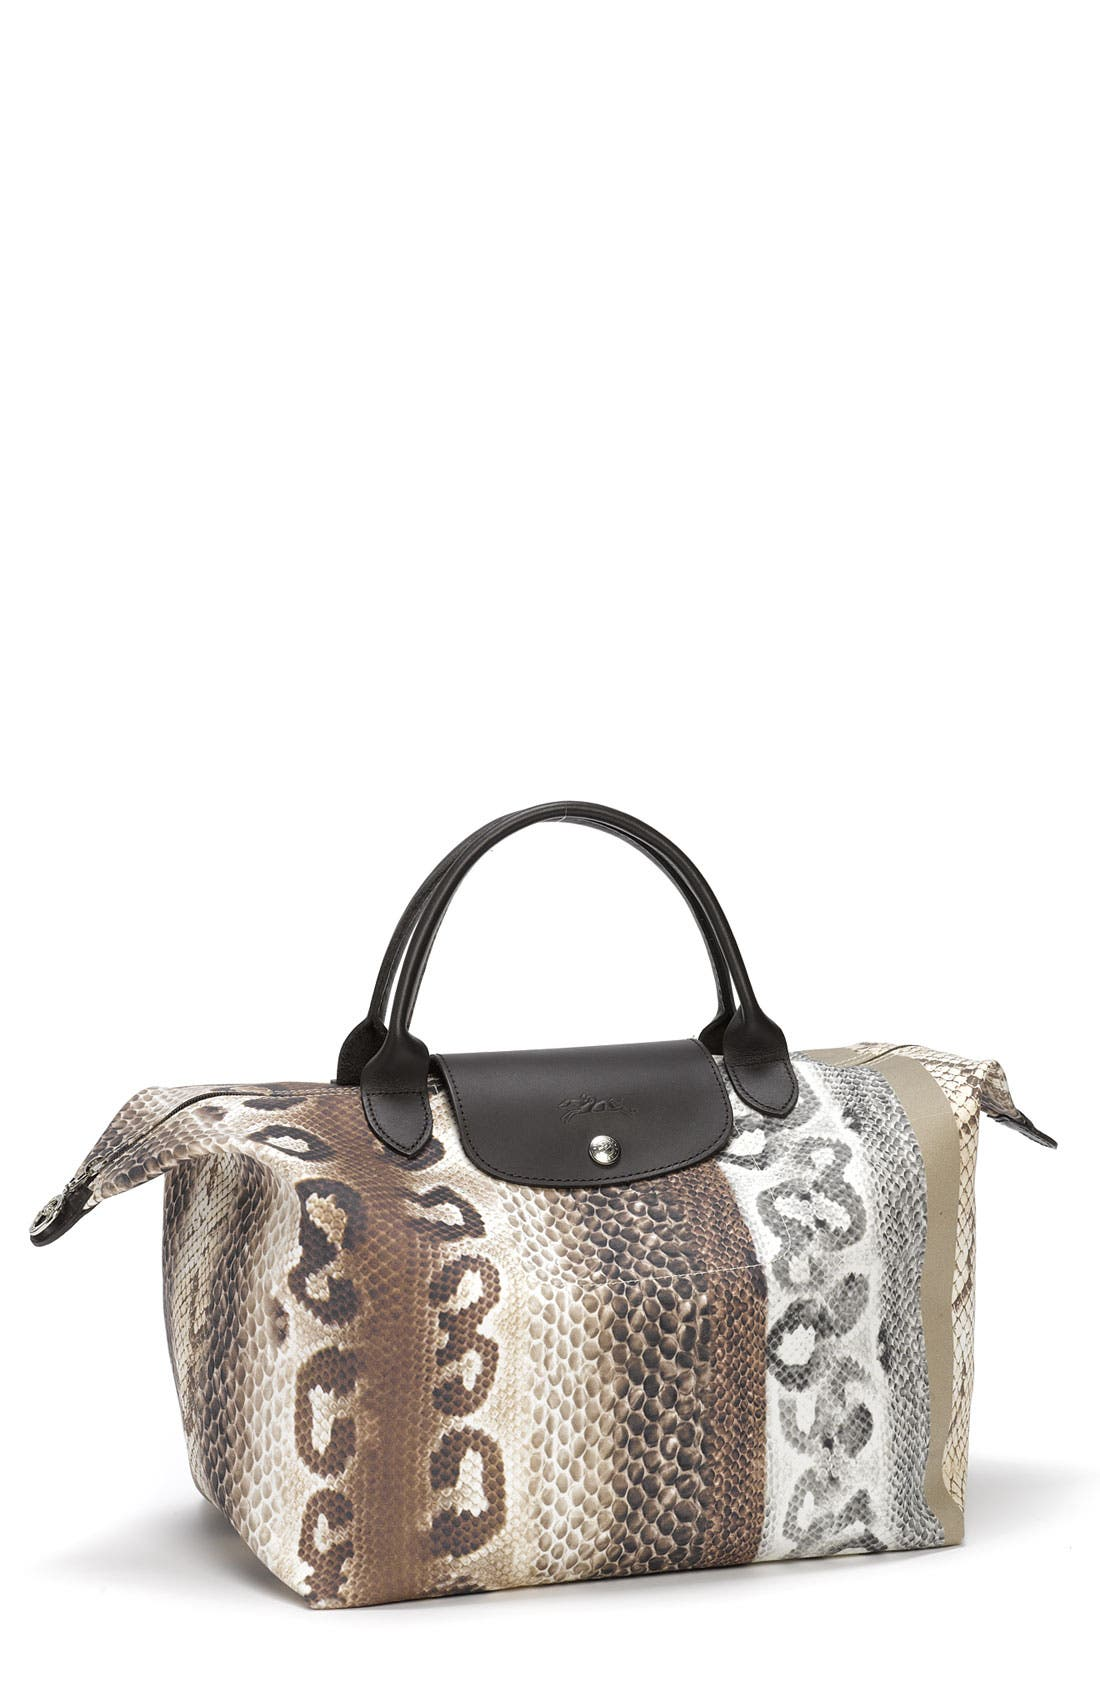 Alternate Image 1 Selected - Longchamp 'Reptiligne Toile' Handbag